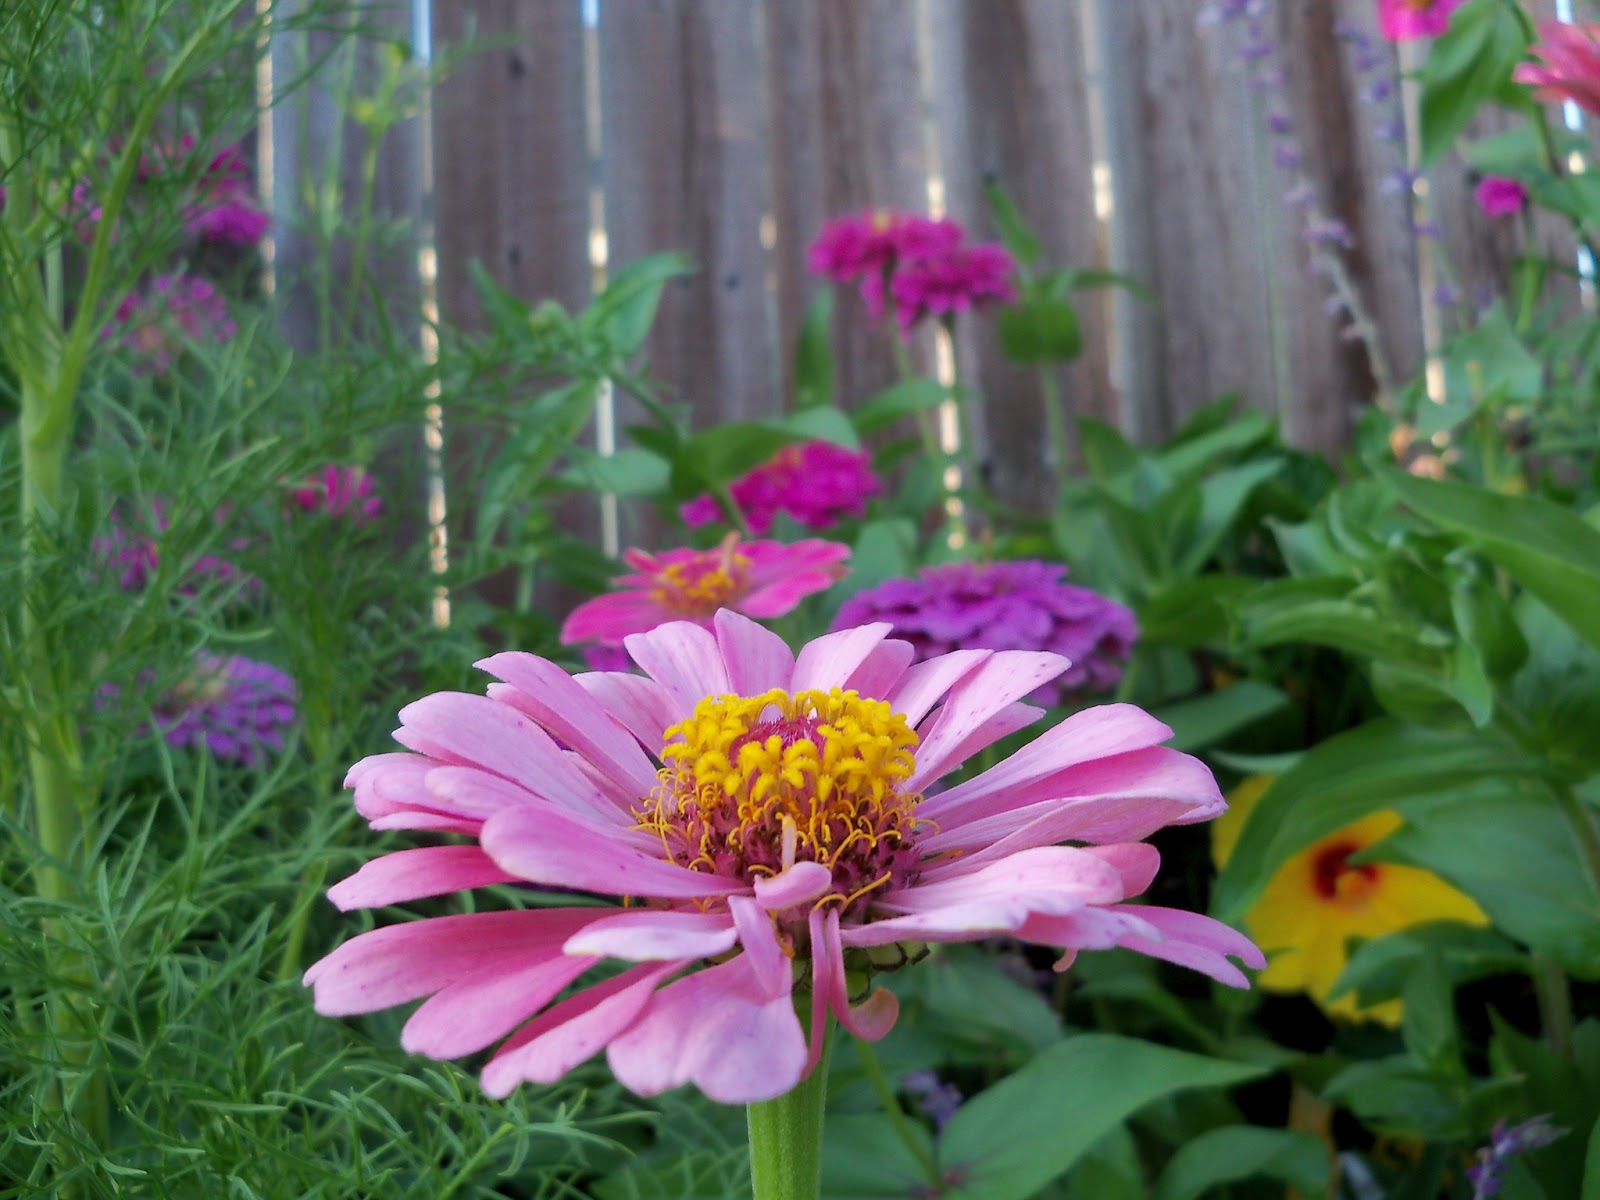 Gardening 2012 - 115_2635.JPG